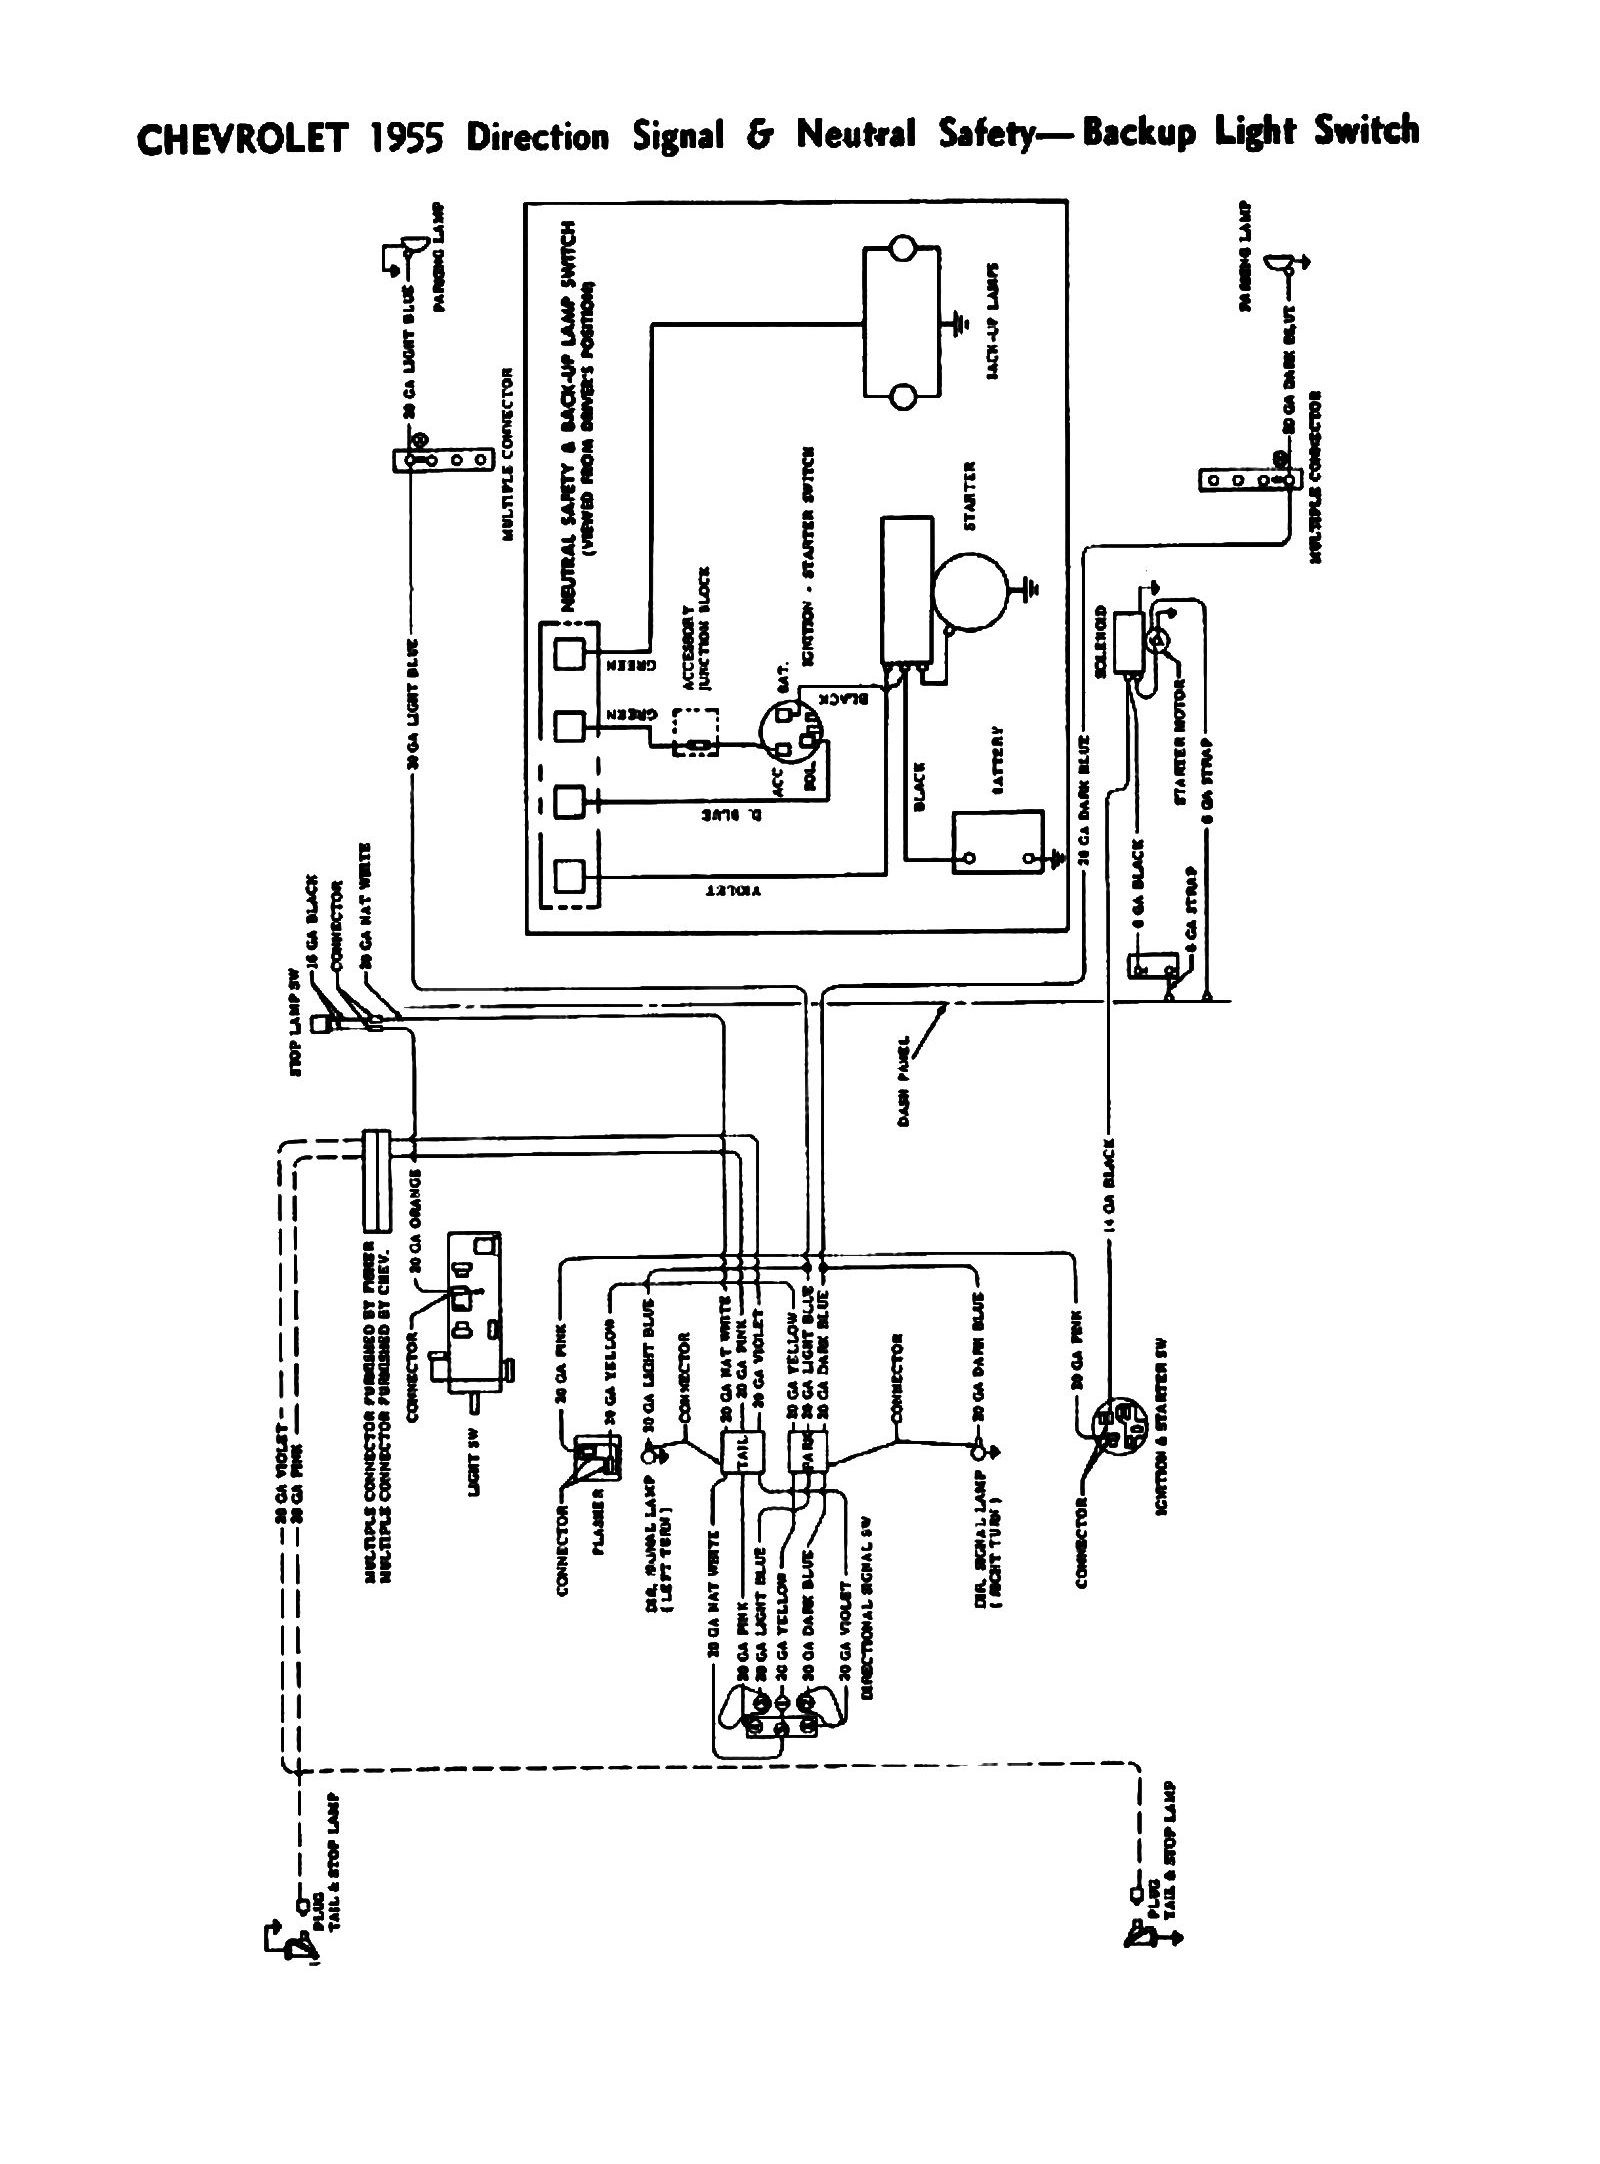 truck heater wiring diagram introduction to electrical wiring rh jillkamil com Dayton Unit Heater Wiring Diagram 3 Phase Heater Wiring Diagram